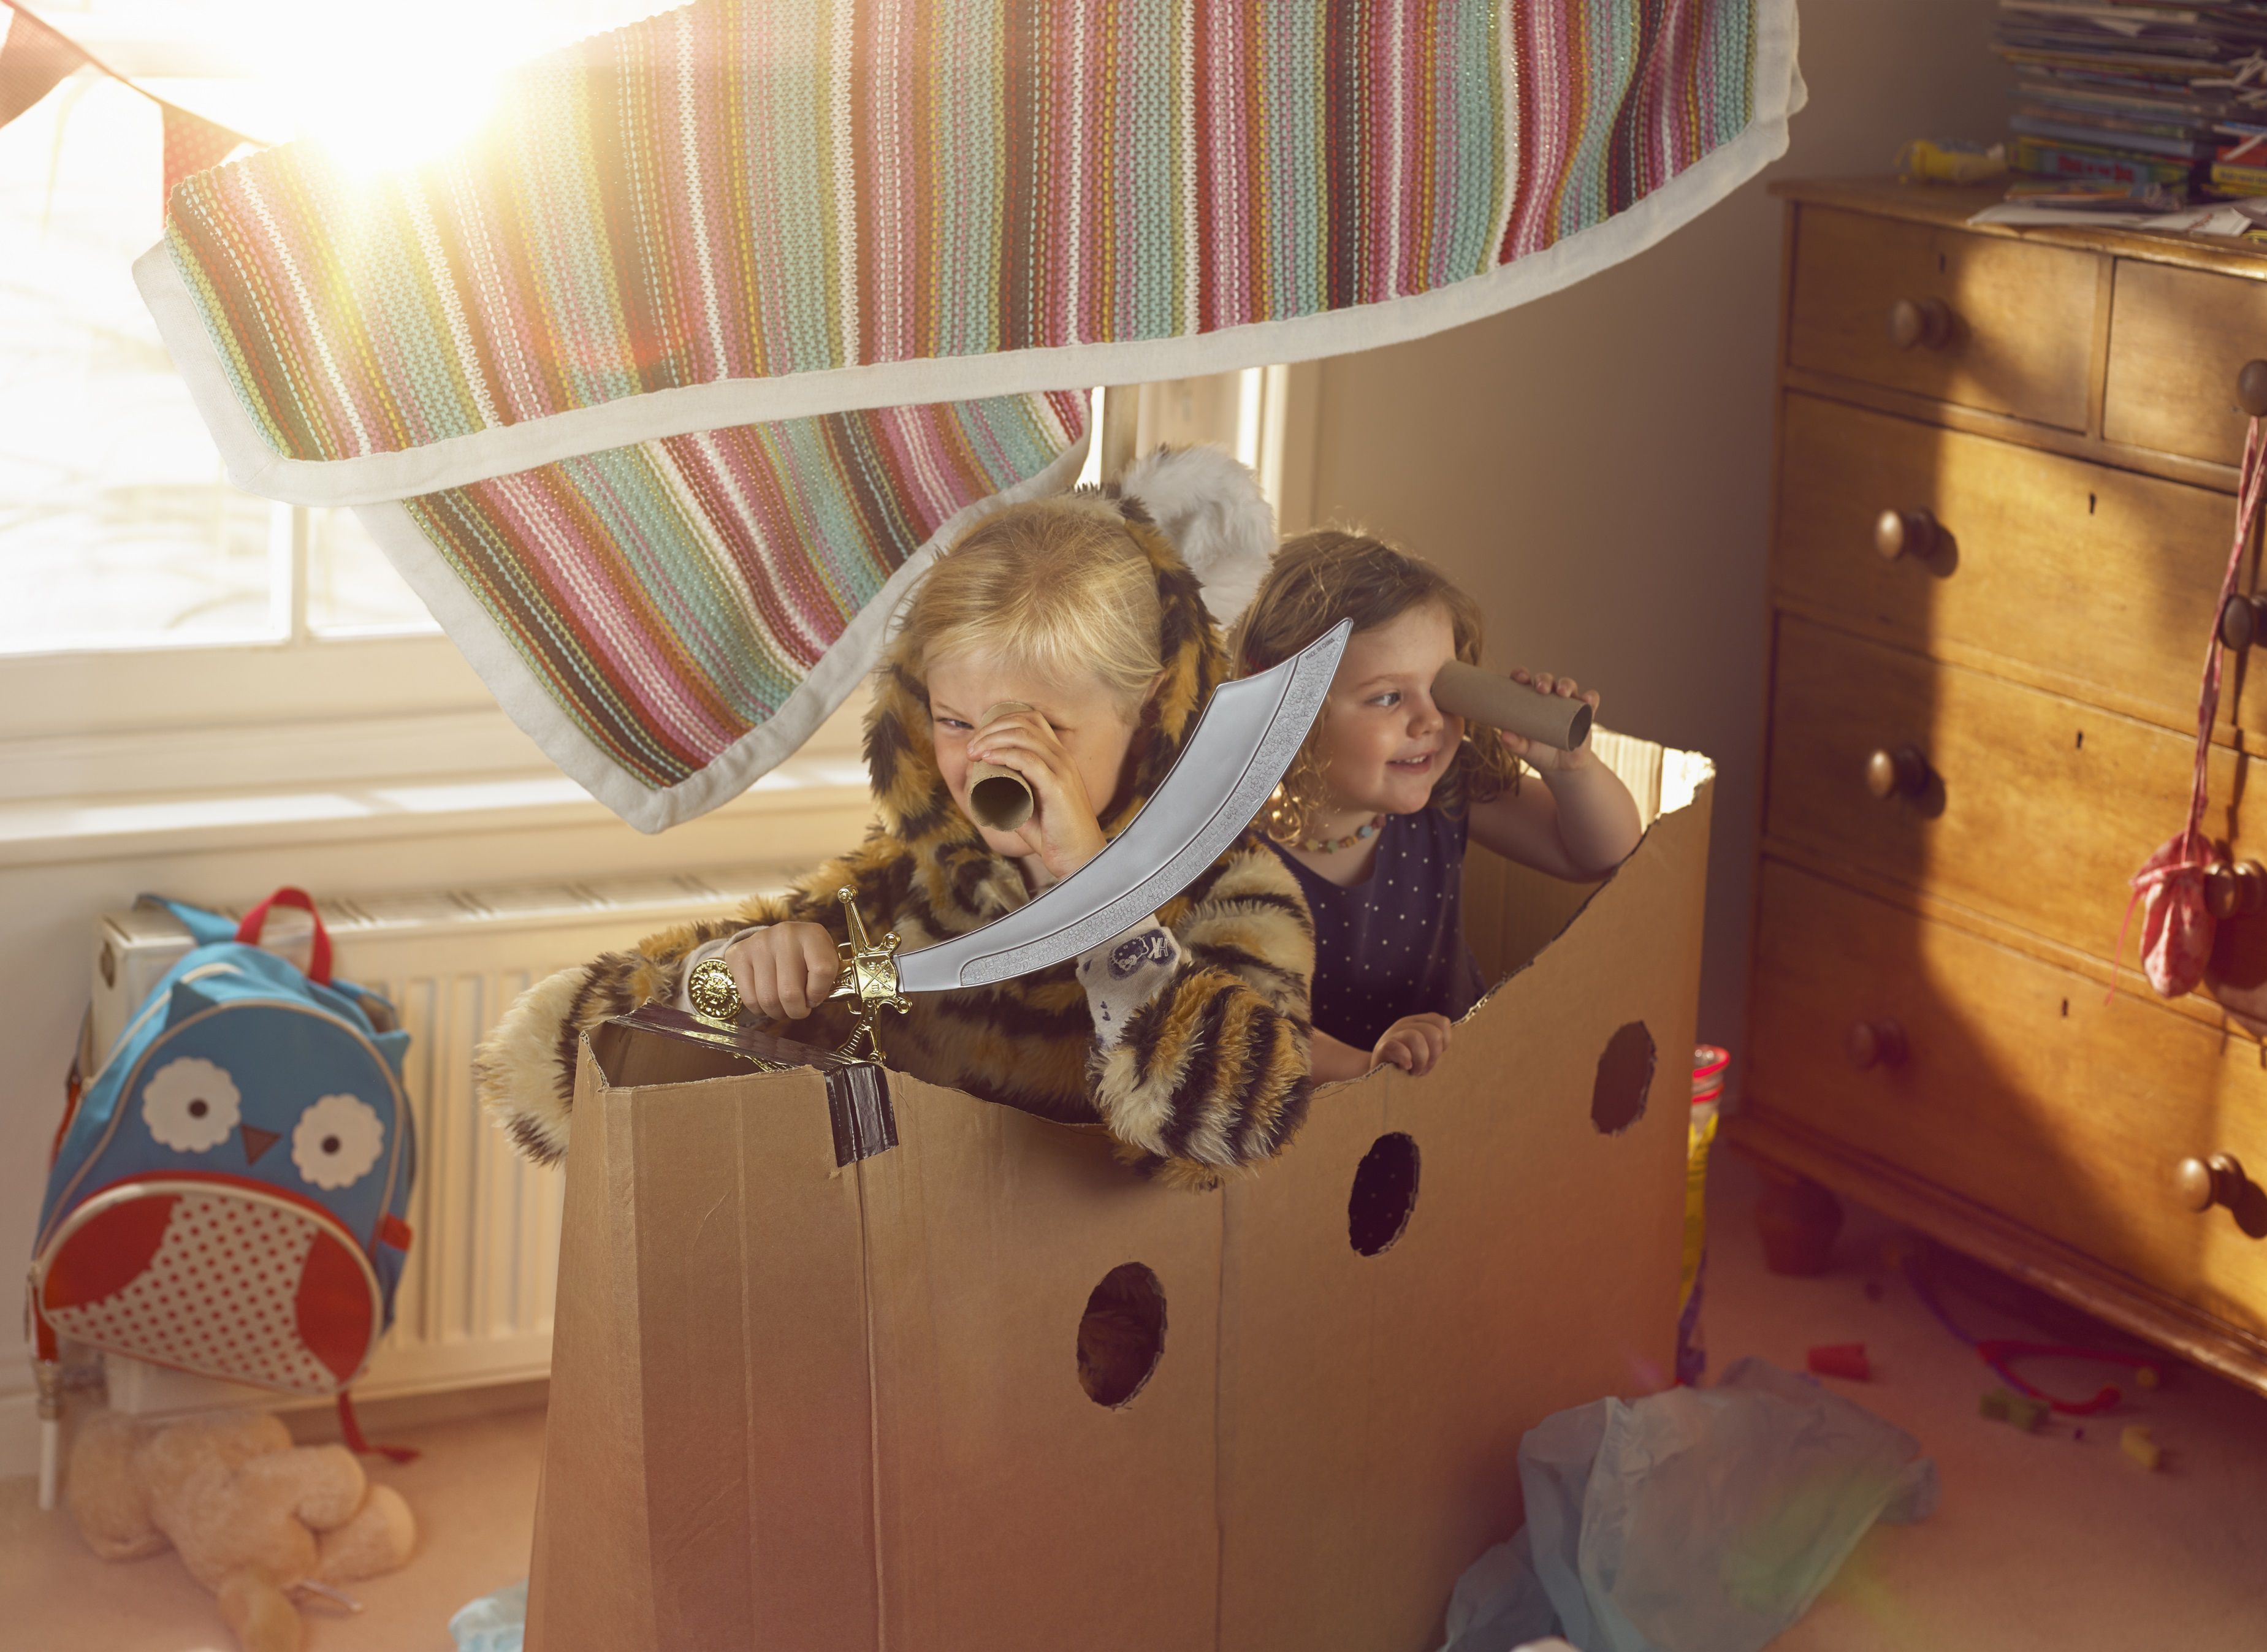 pretend play - girls in cardboard box playing pirates